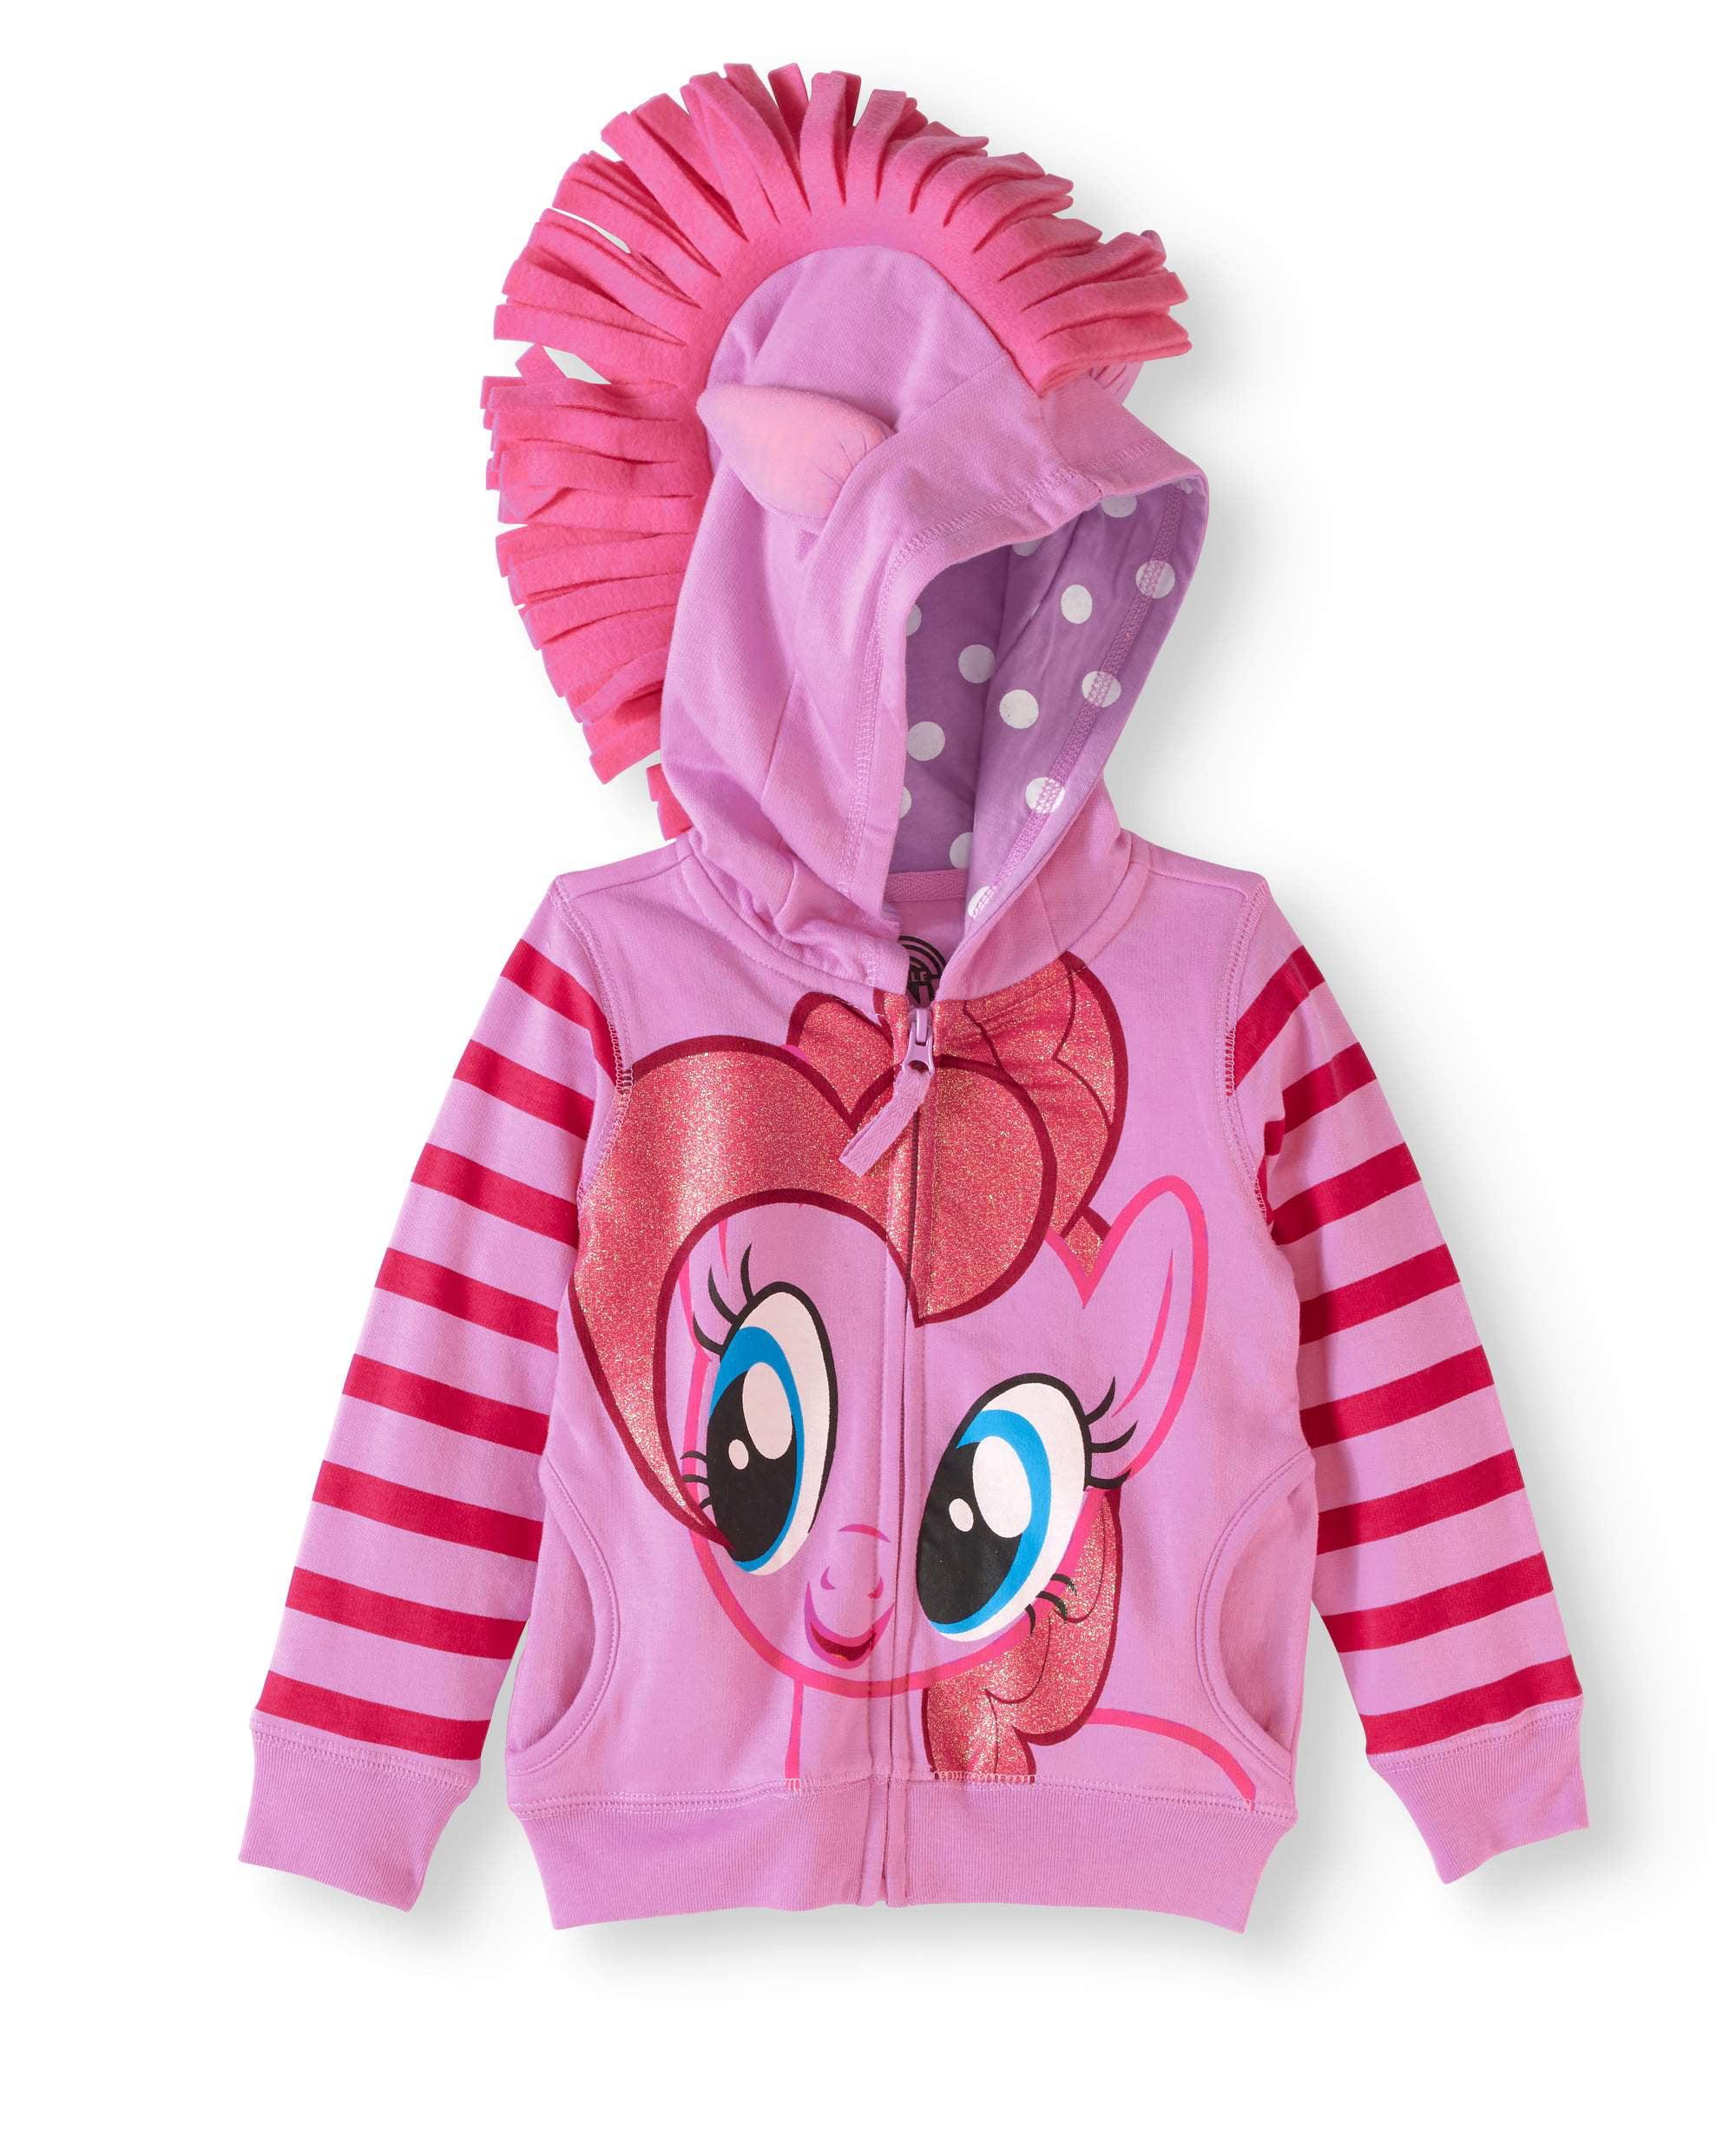 Costume Zip Hoodie (Toddler Girls)